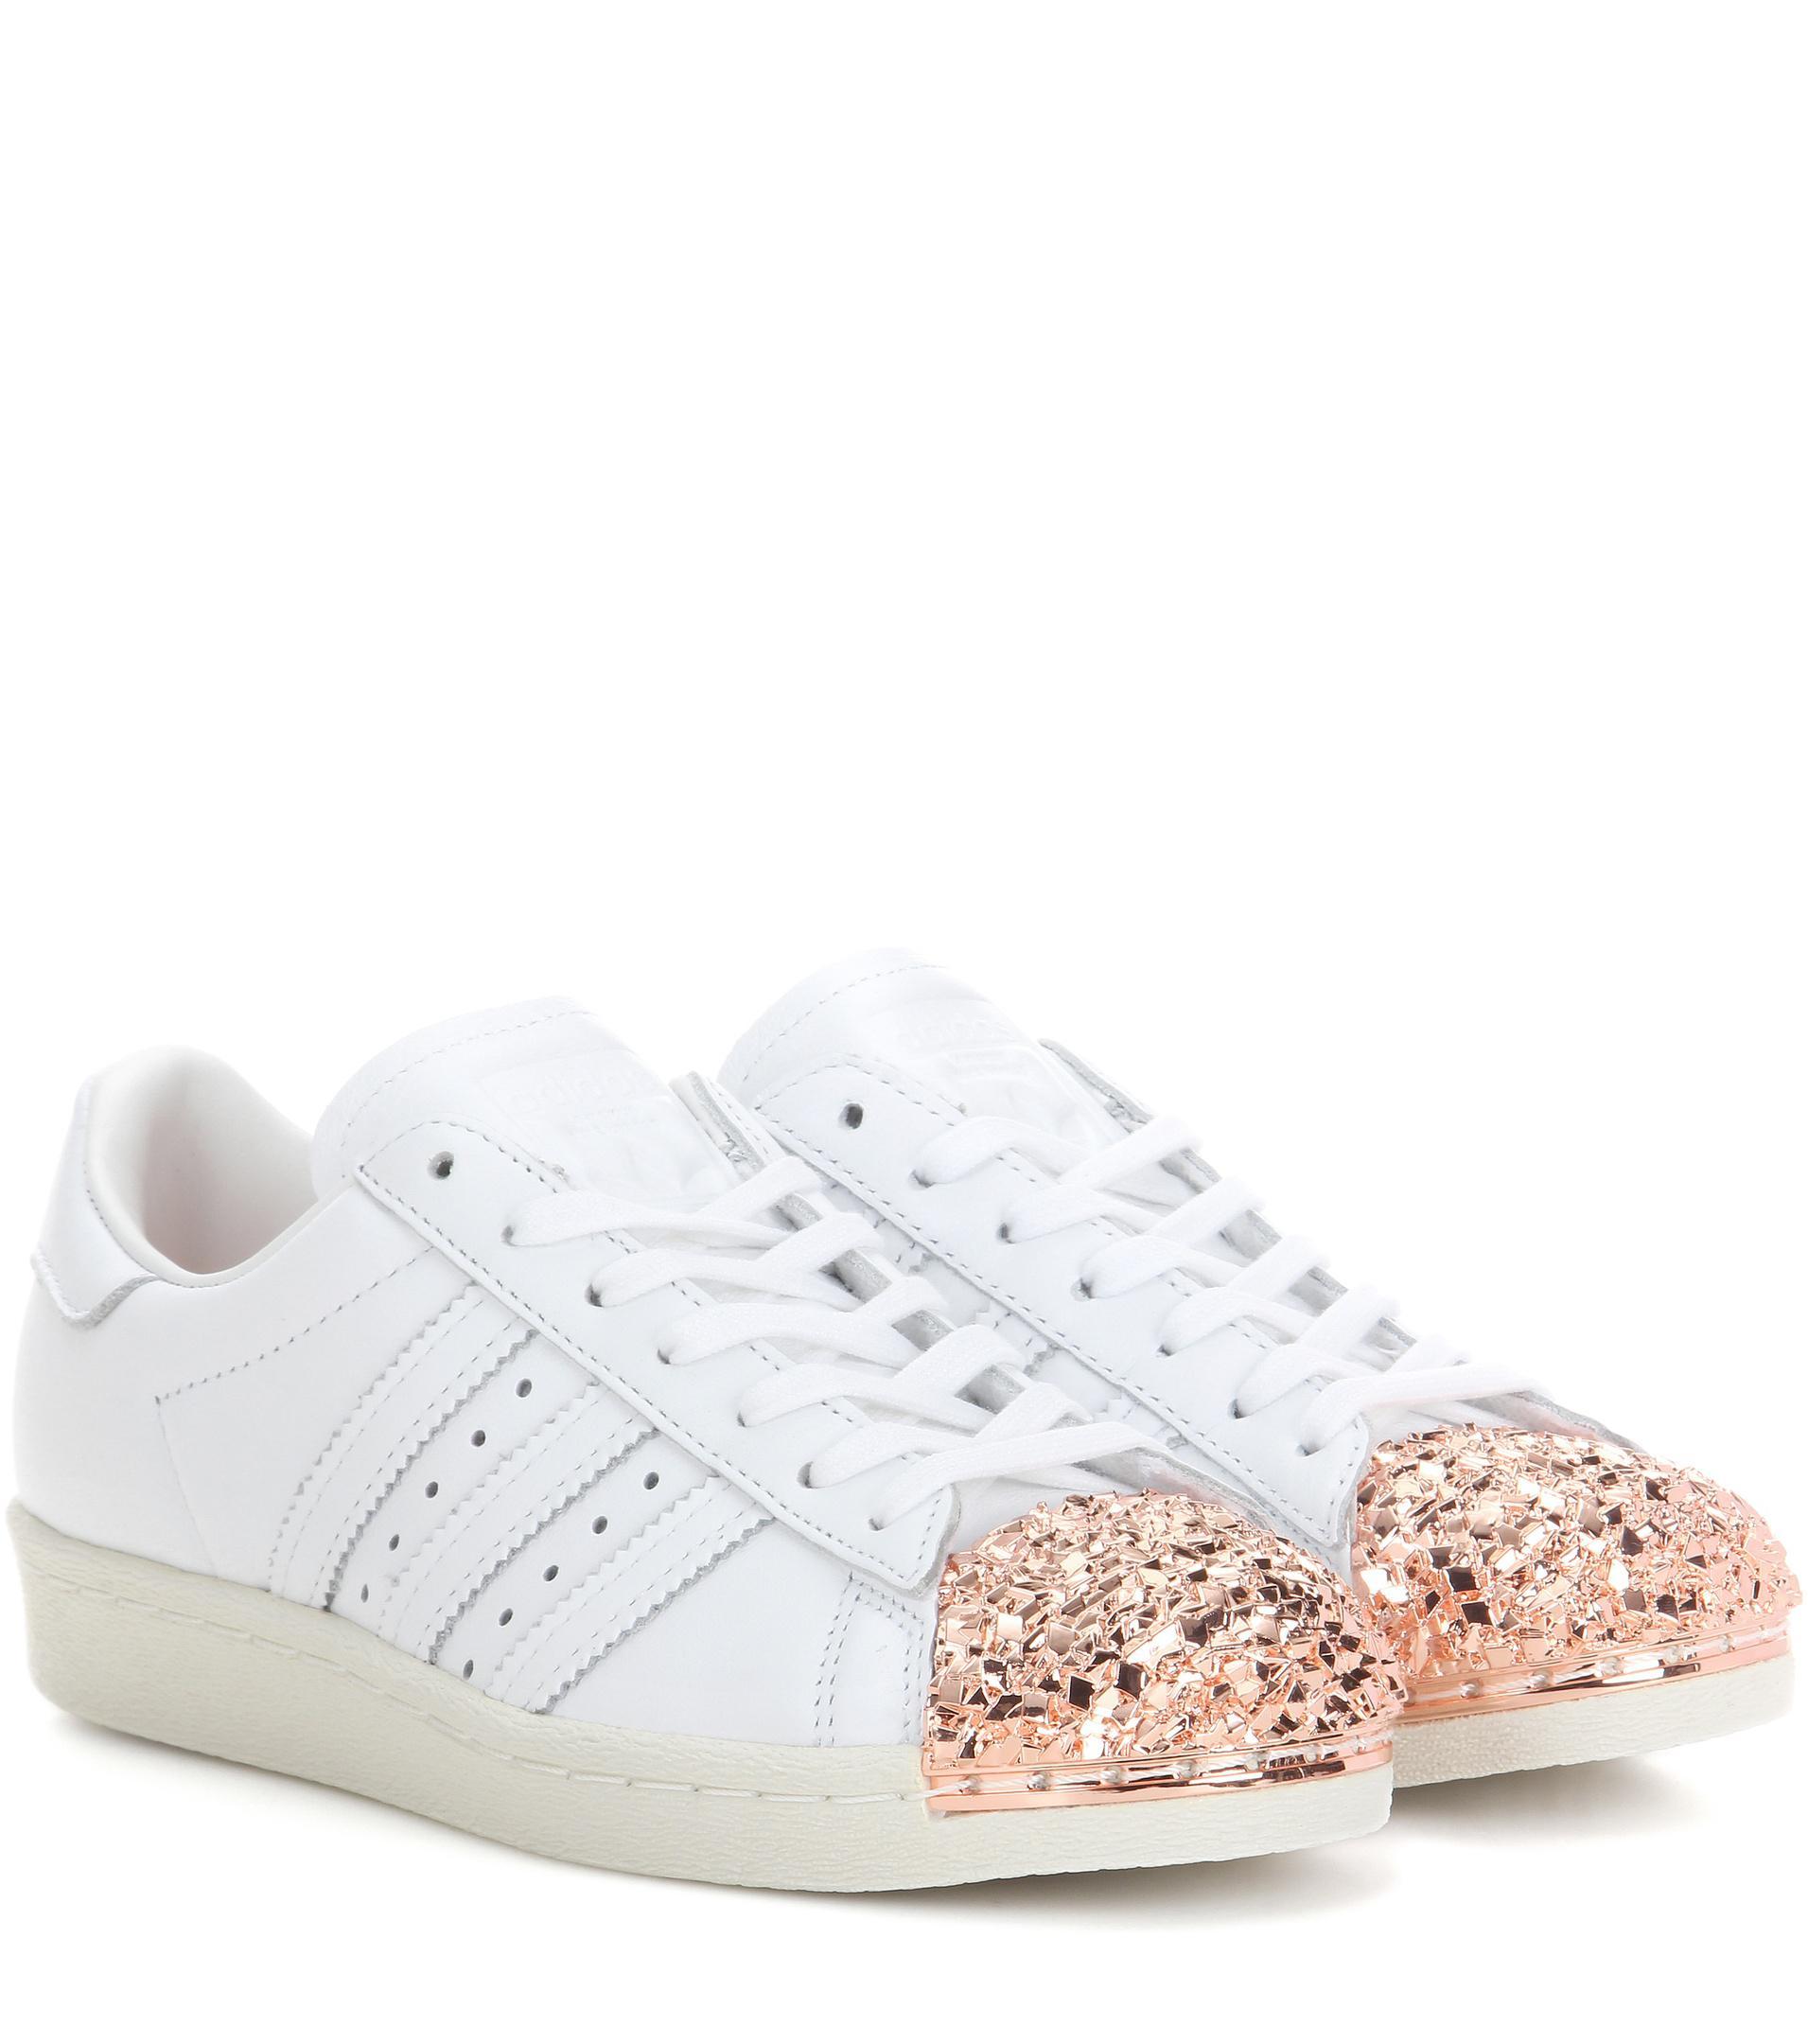 pretty nice 3f69c 142e8 ... sweden lyst adidas originals superstar 80s 3d embellished leather 78490  f1eb0